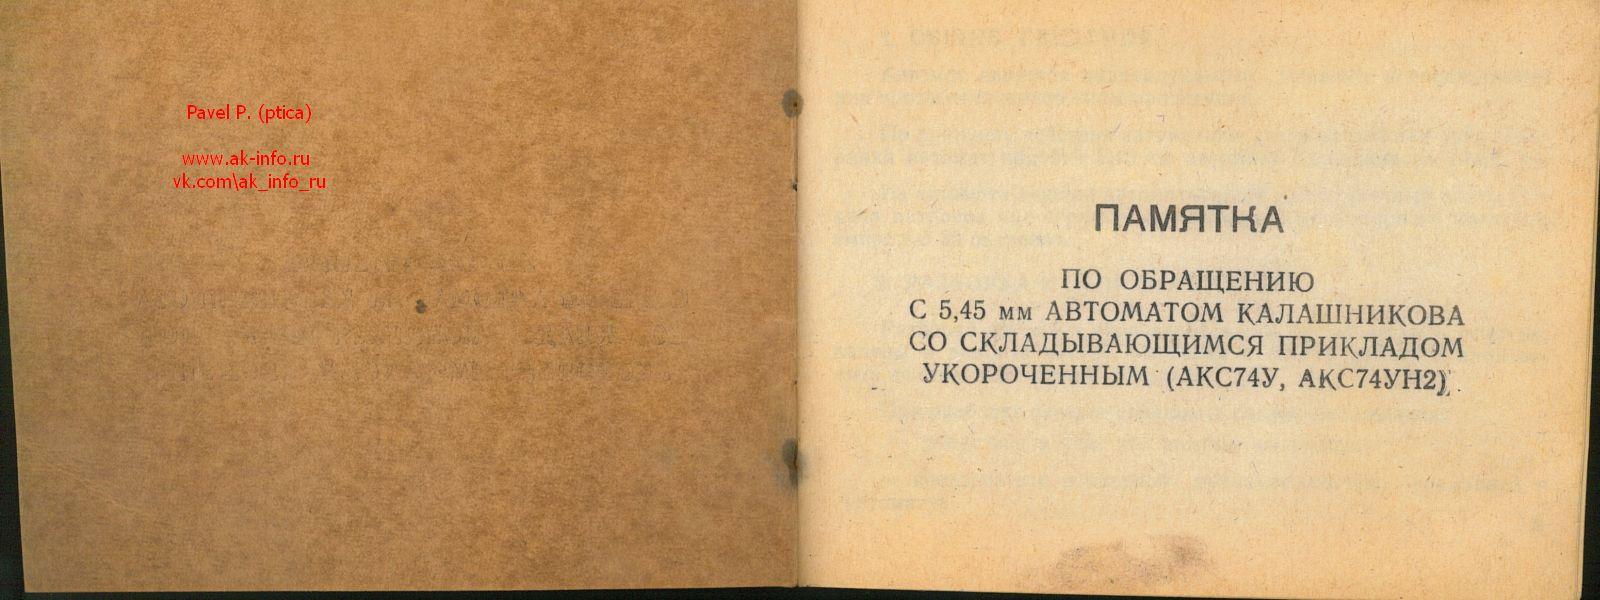 http://www.ak-info.ru/ak74/p_aks74u_87/aksu02.jpg